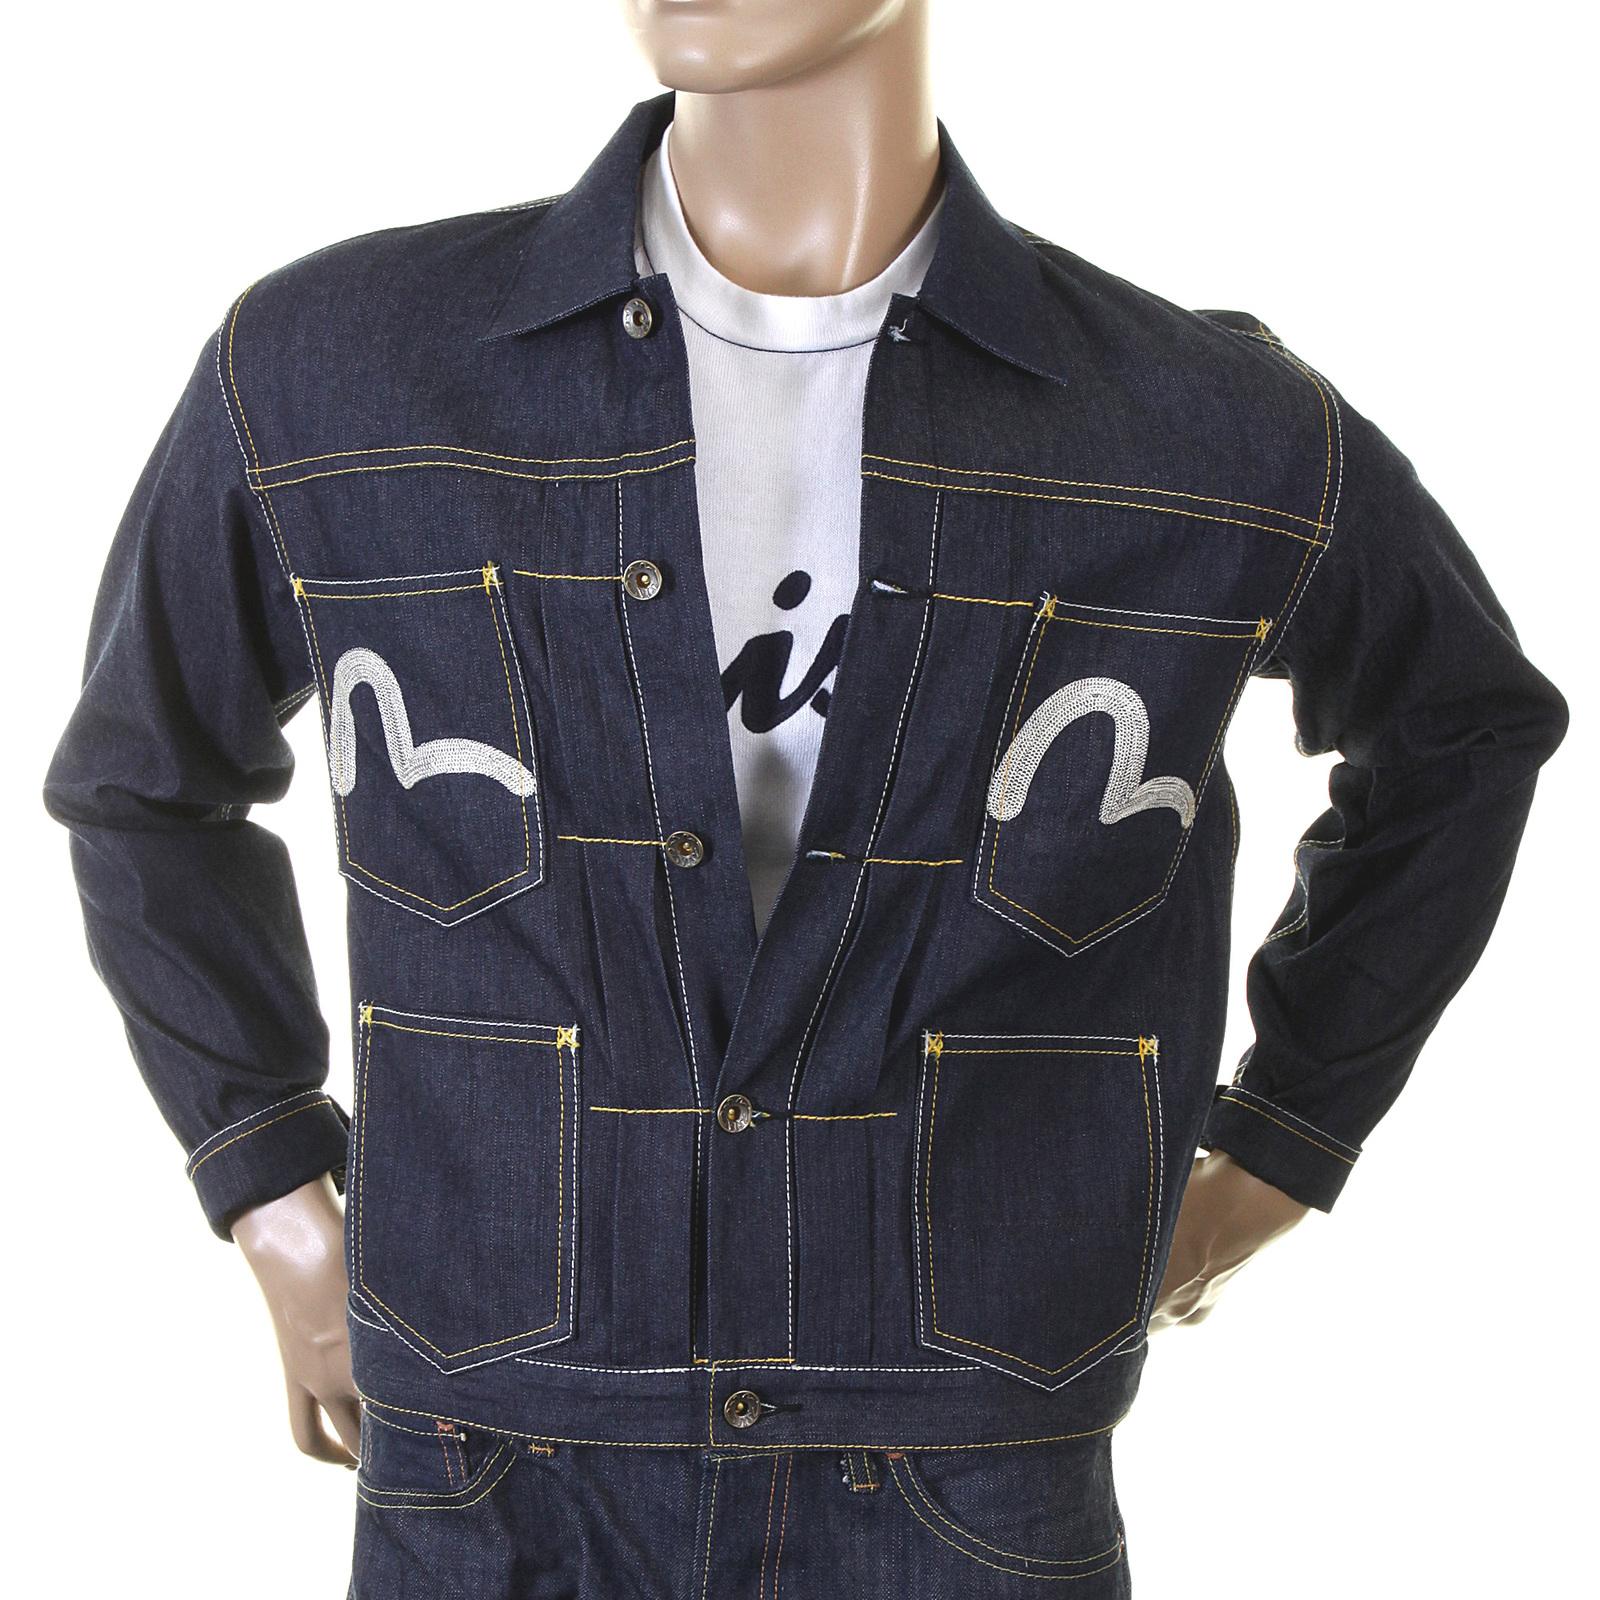 7f2602275d4b Evisu unwashed raw denim early original genuine rare EV3705 D100 five  pocket jacket EVIS4714 at Togged Clothing